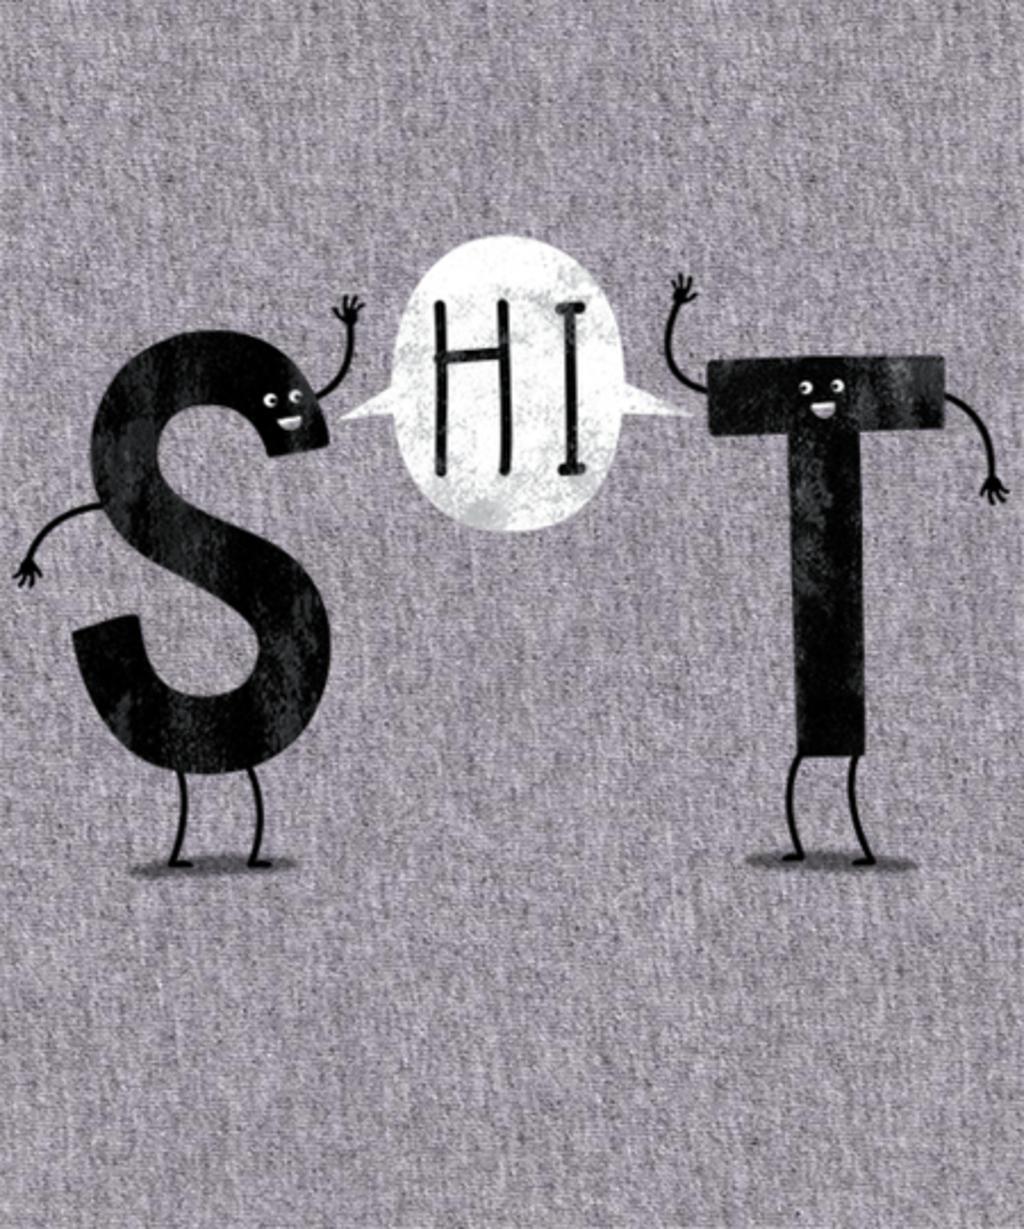 Qwertee: S-HI-T!